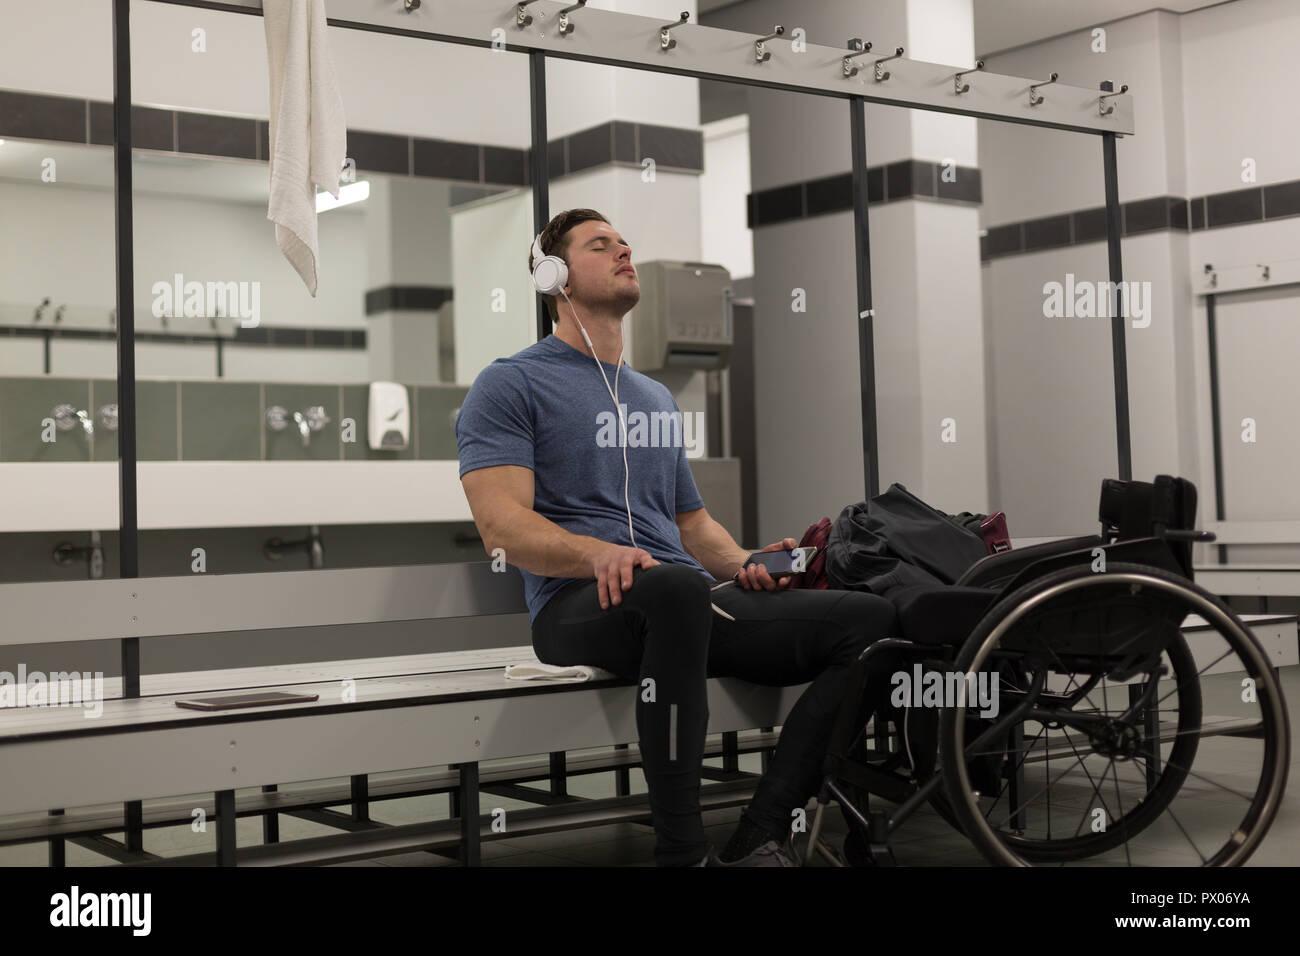 Disabled man listening music on headphones - Stock Image